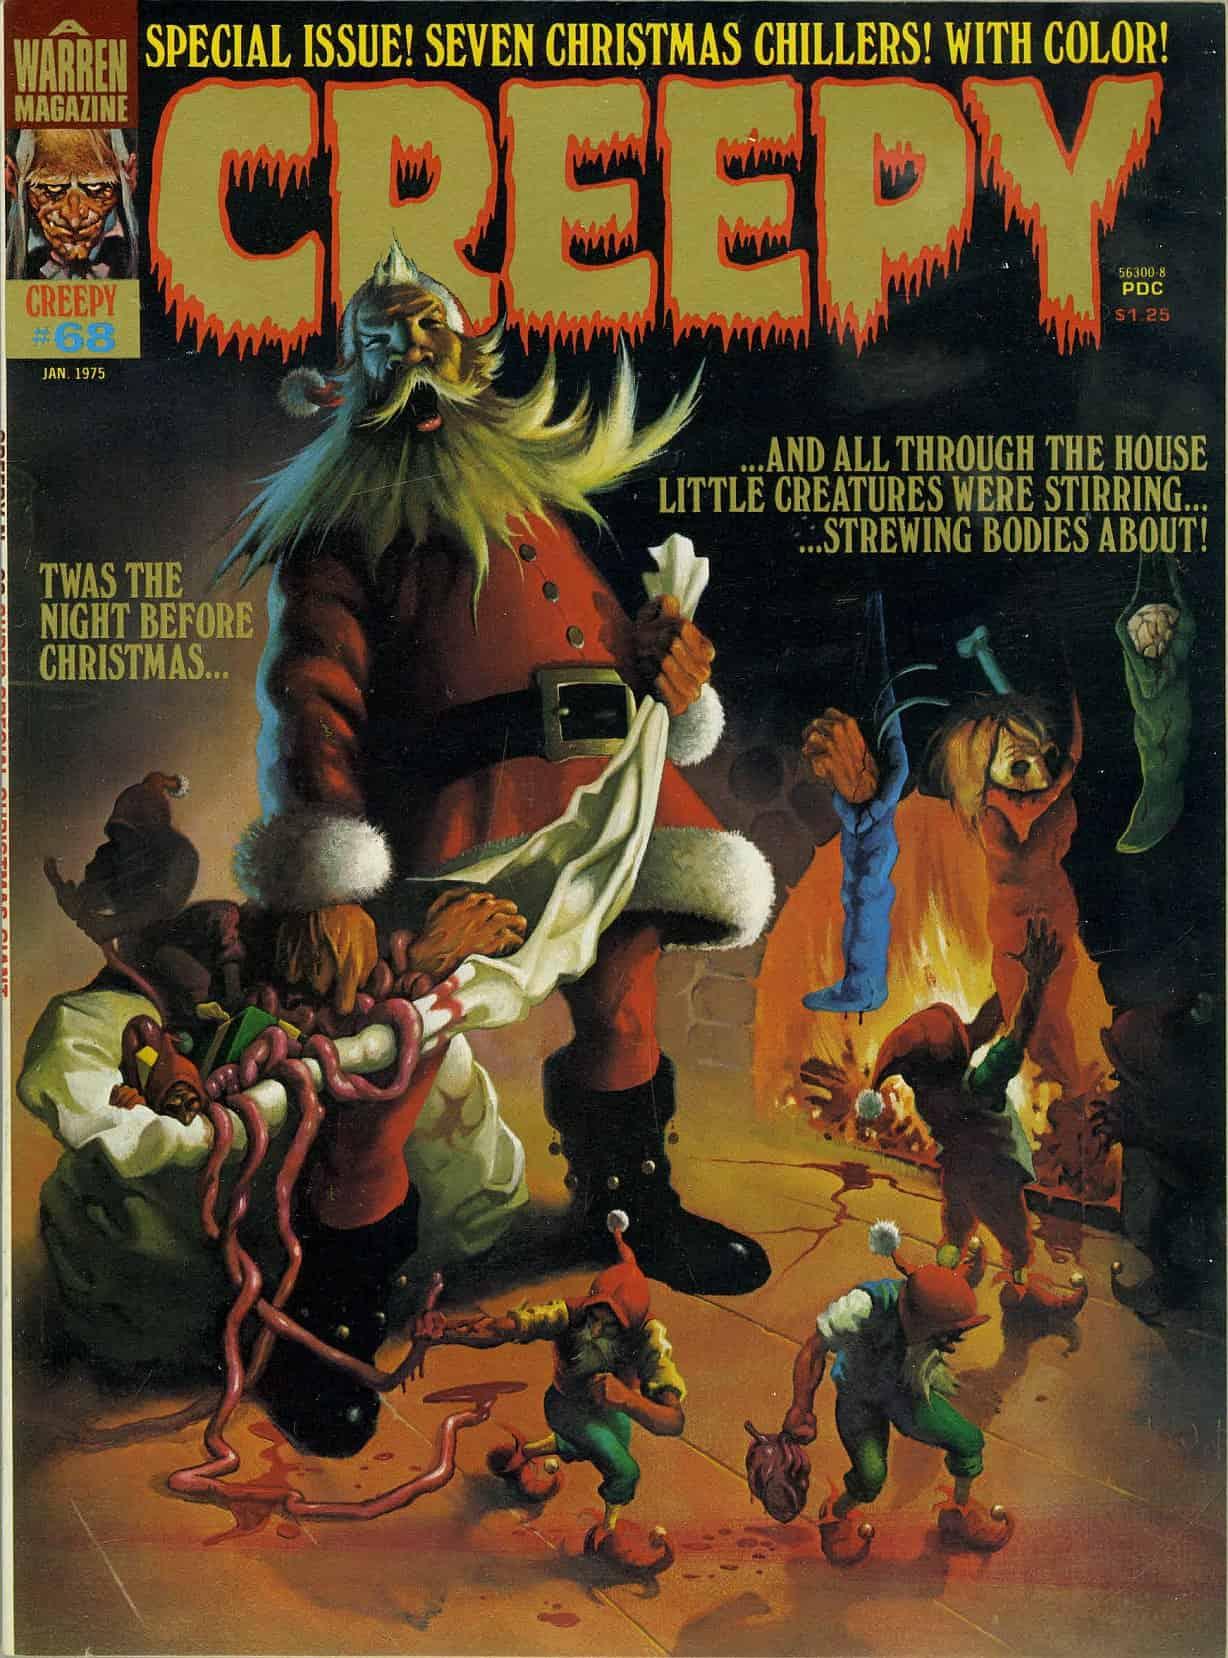 CreepyMagazine 068-00